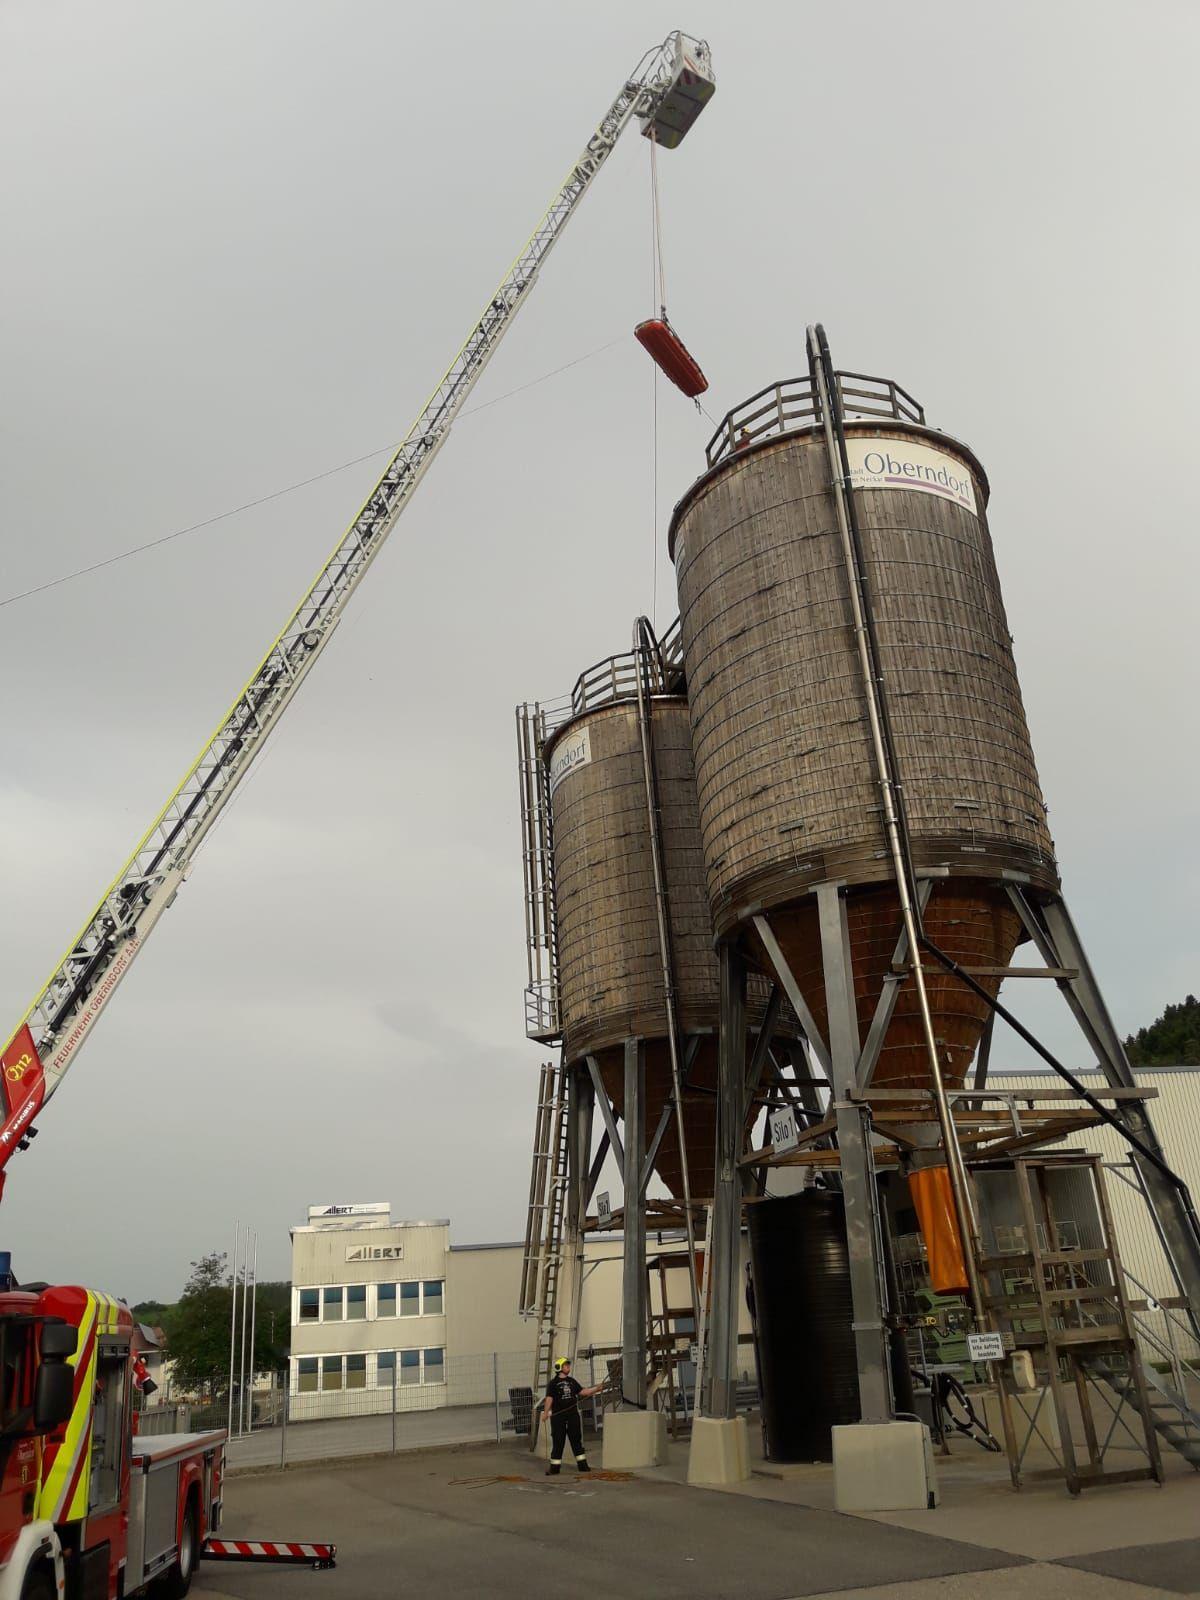 ERHT | Feuerwehr Oberndorf